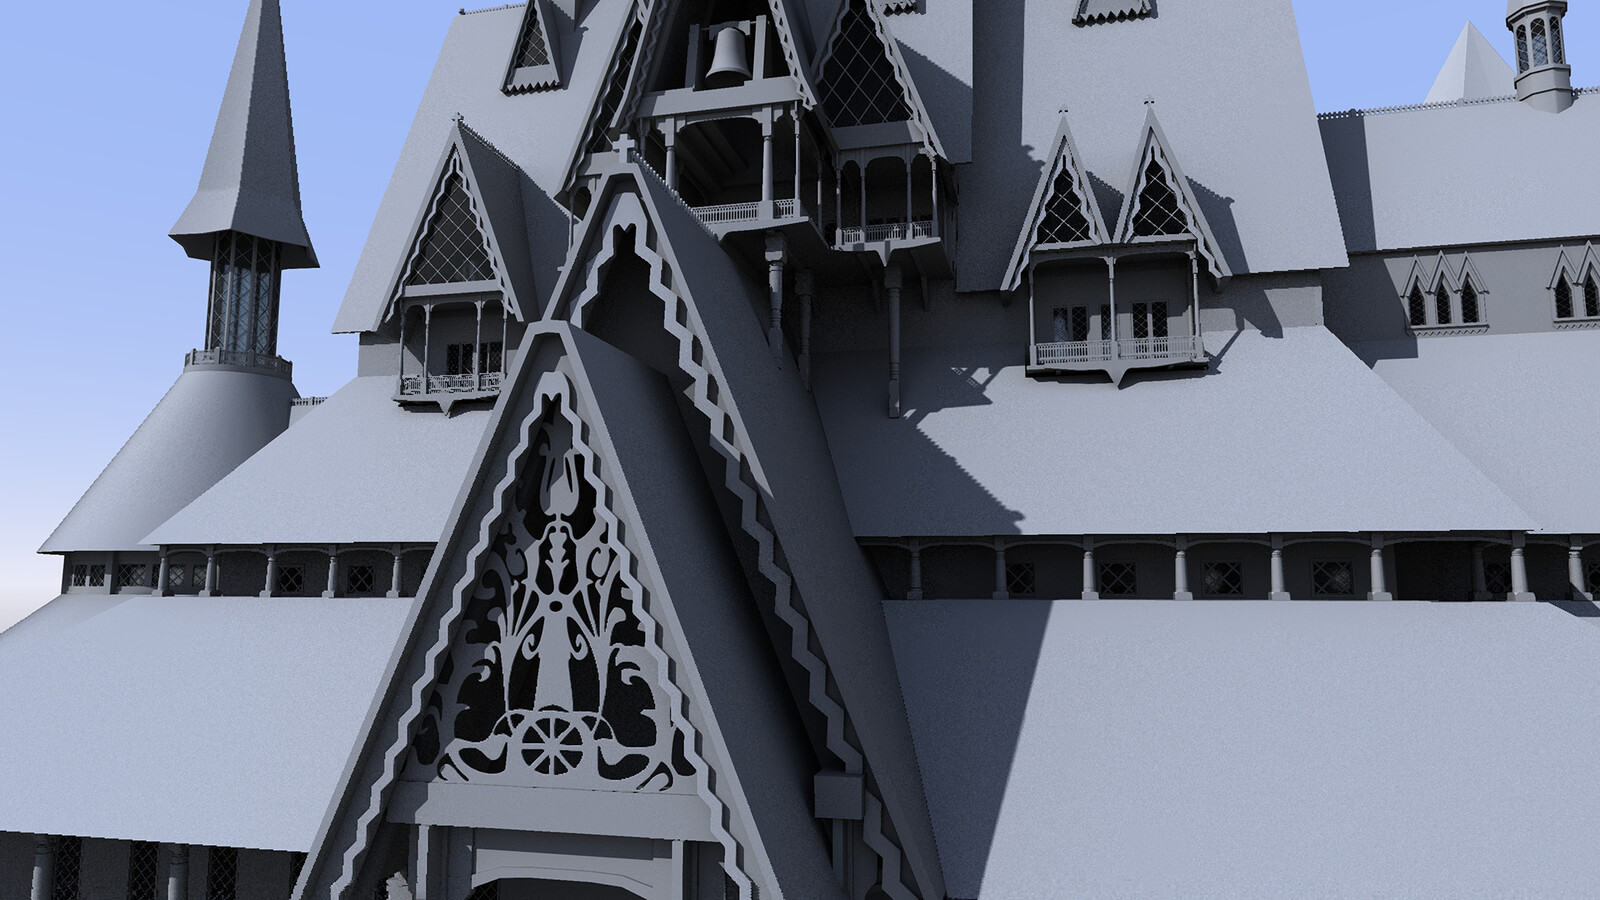 Arendelle - Side building and detail added - CU